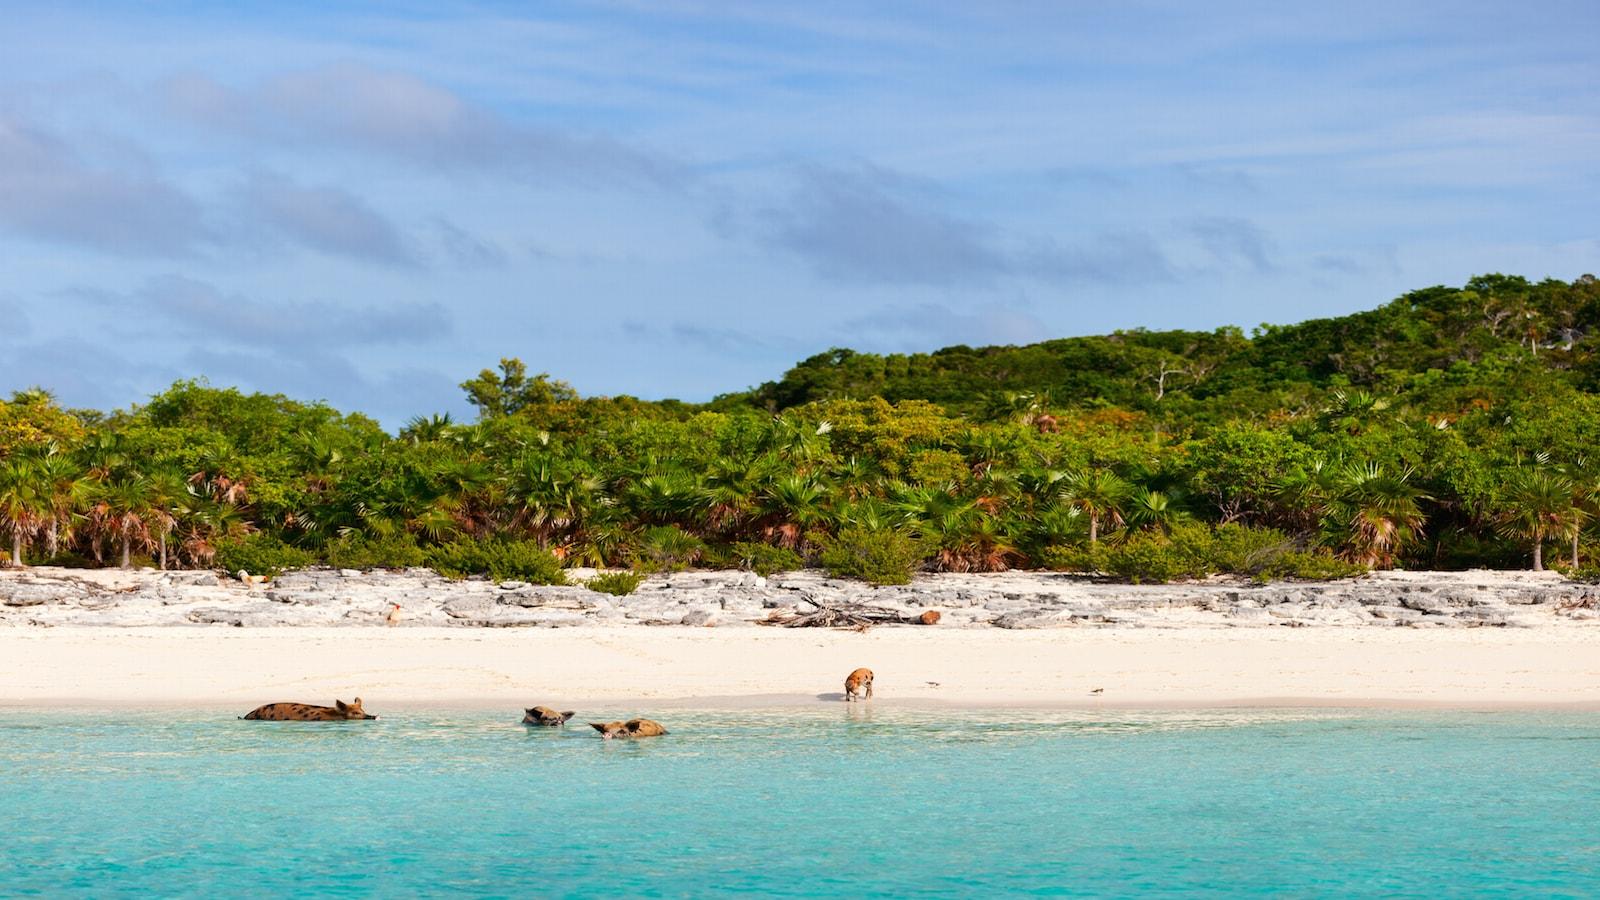 Visit the swimming pigs of the Big Major Cay Bahamas - IYC